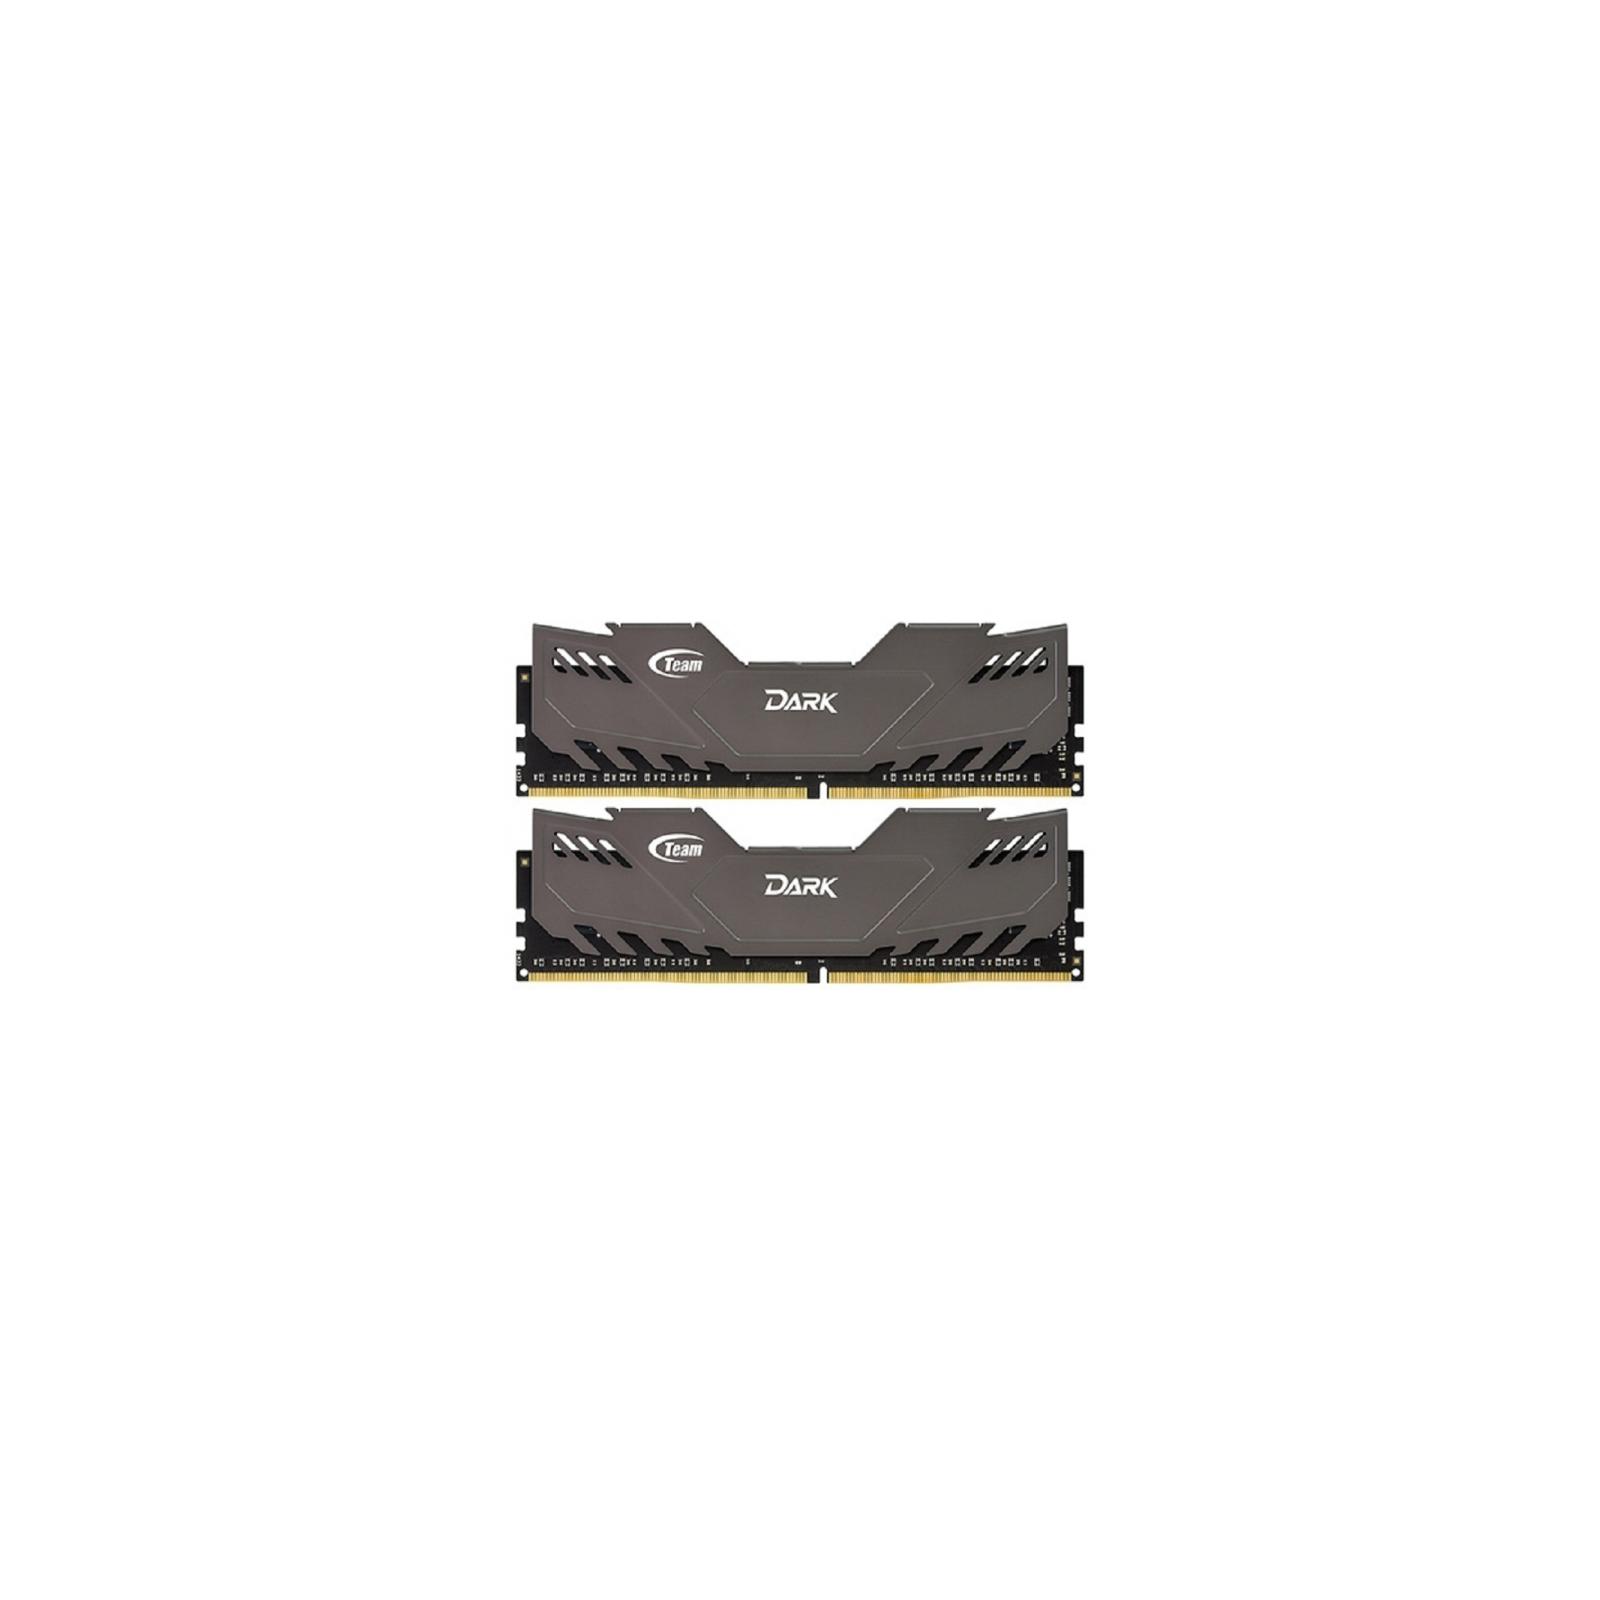 Модуль памяти для компьютера DDR4 16GB (2x8GB) 2800 MHz Dark Gray Team (TDGED416G2800HC16ADC01)